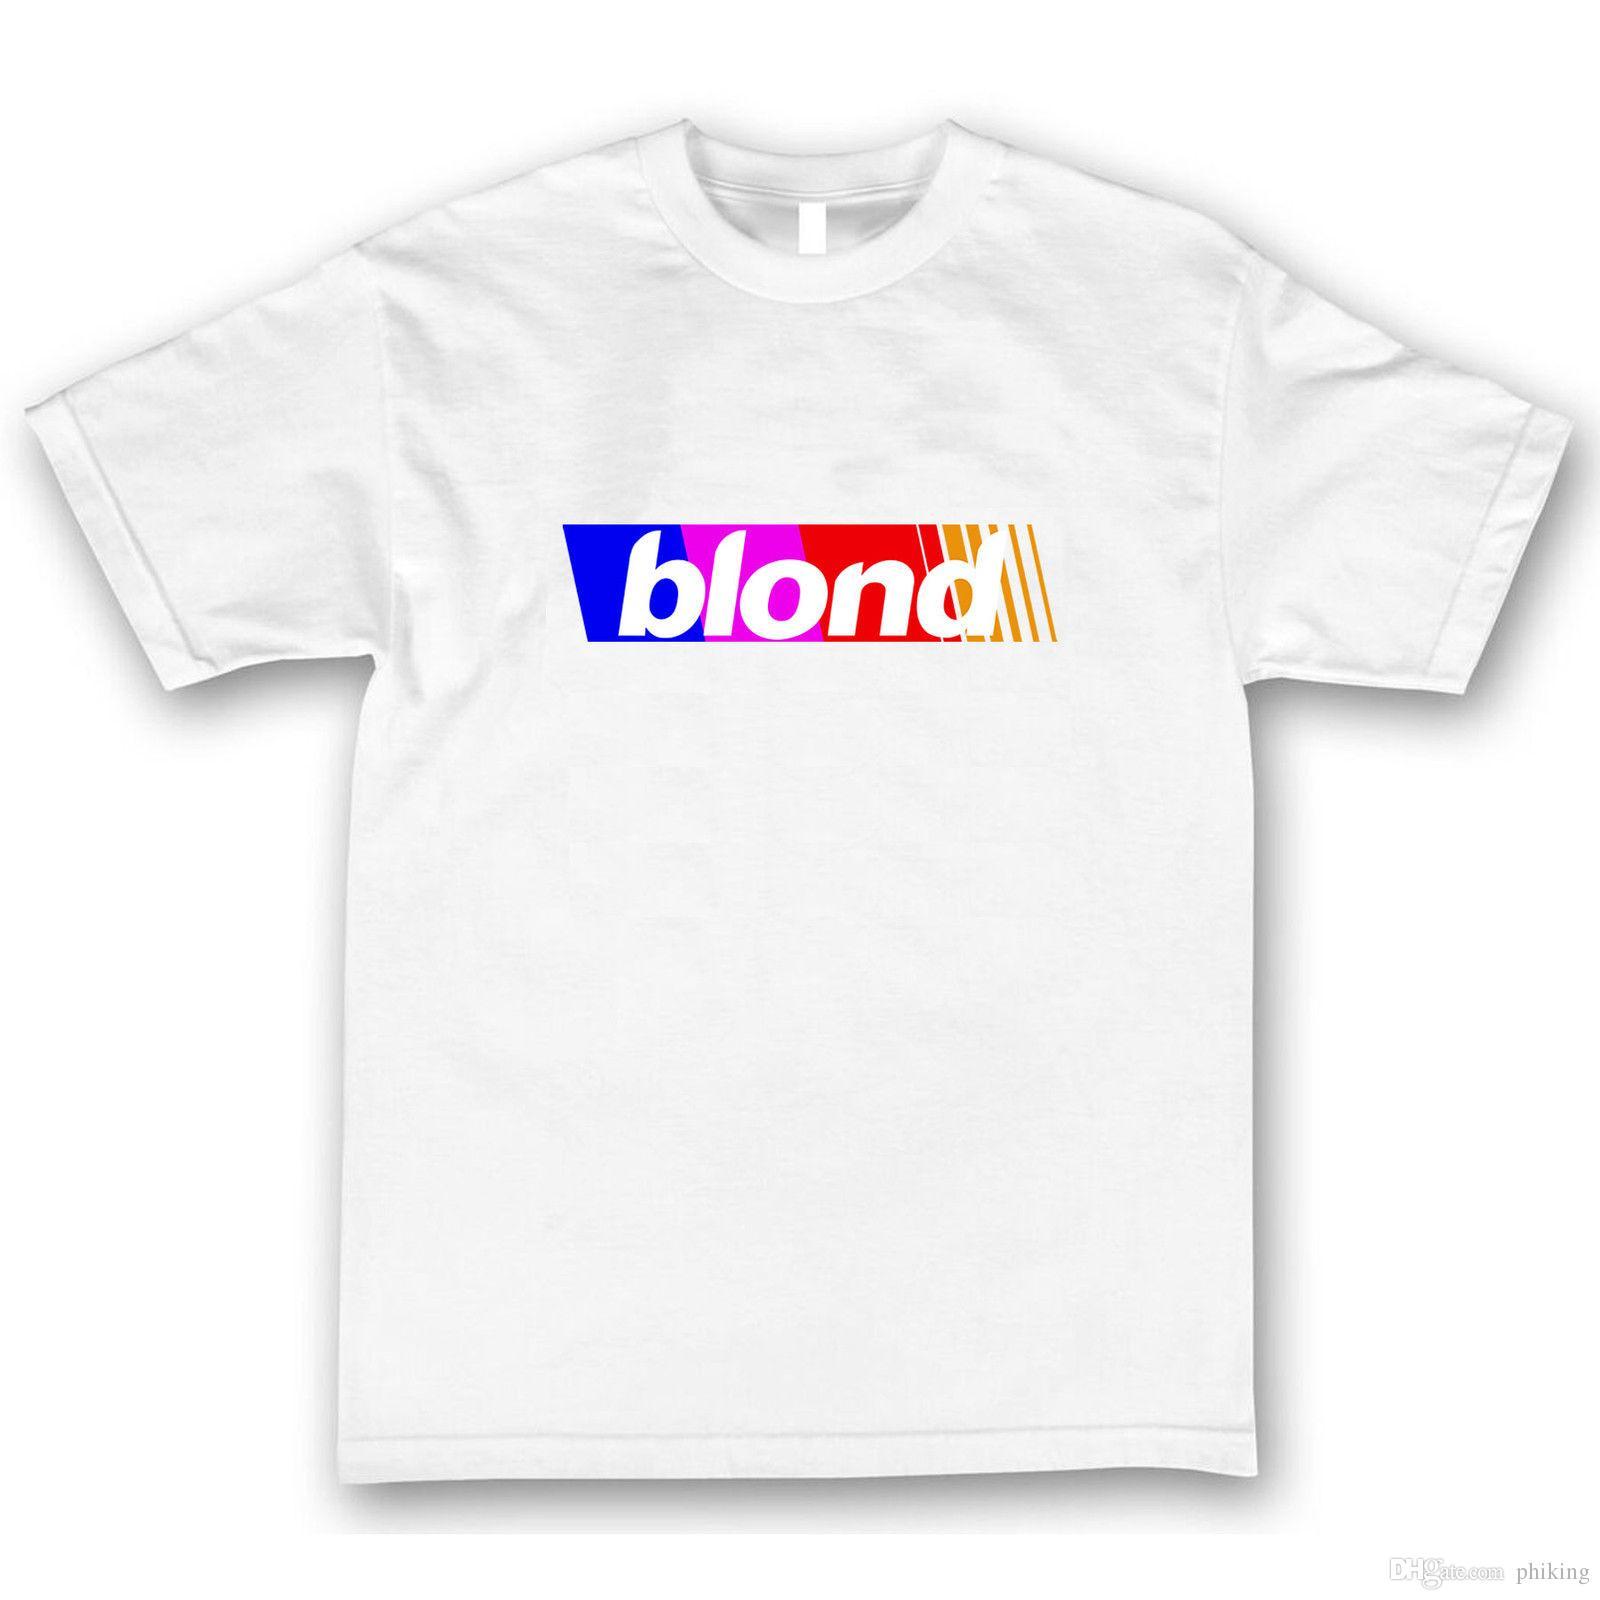 dafe7b0f Frank Ocean Blond Blonde T Shirt Rainbow Channel Orange Concert Nights Tour  Online T Shirt Buy Joke T Shirt From Phiking, $11.01| DHgate.Com